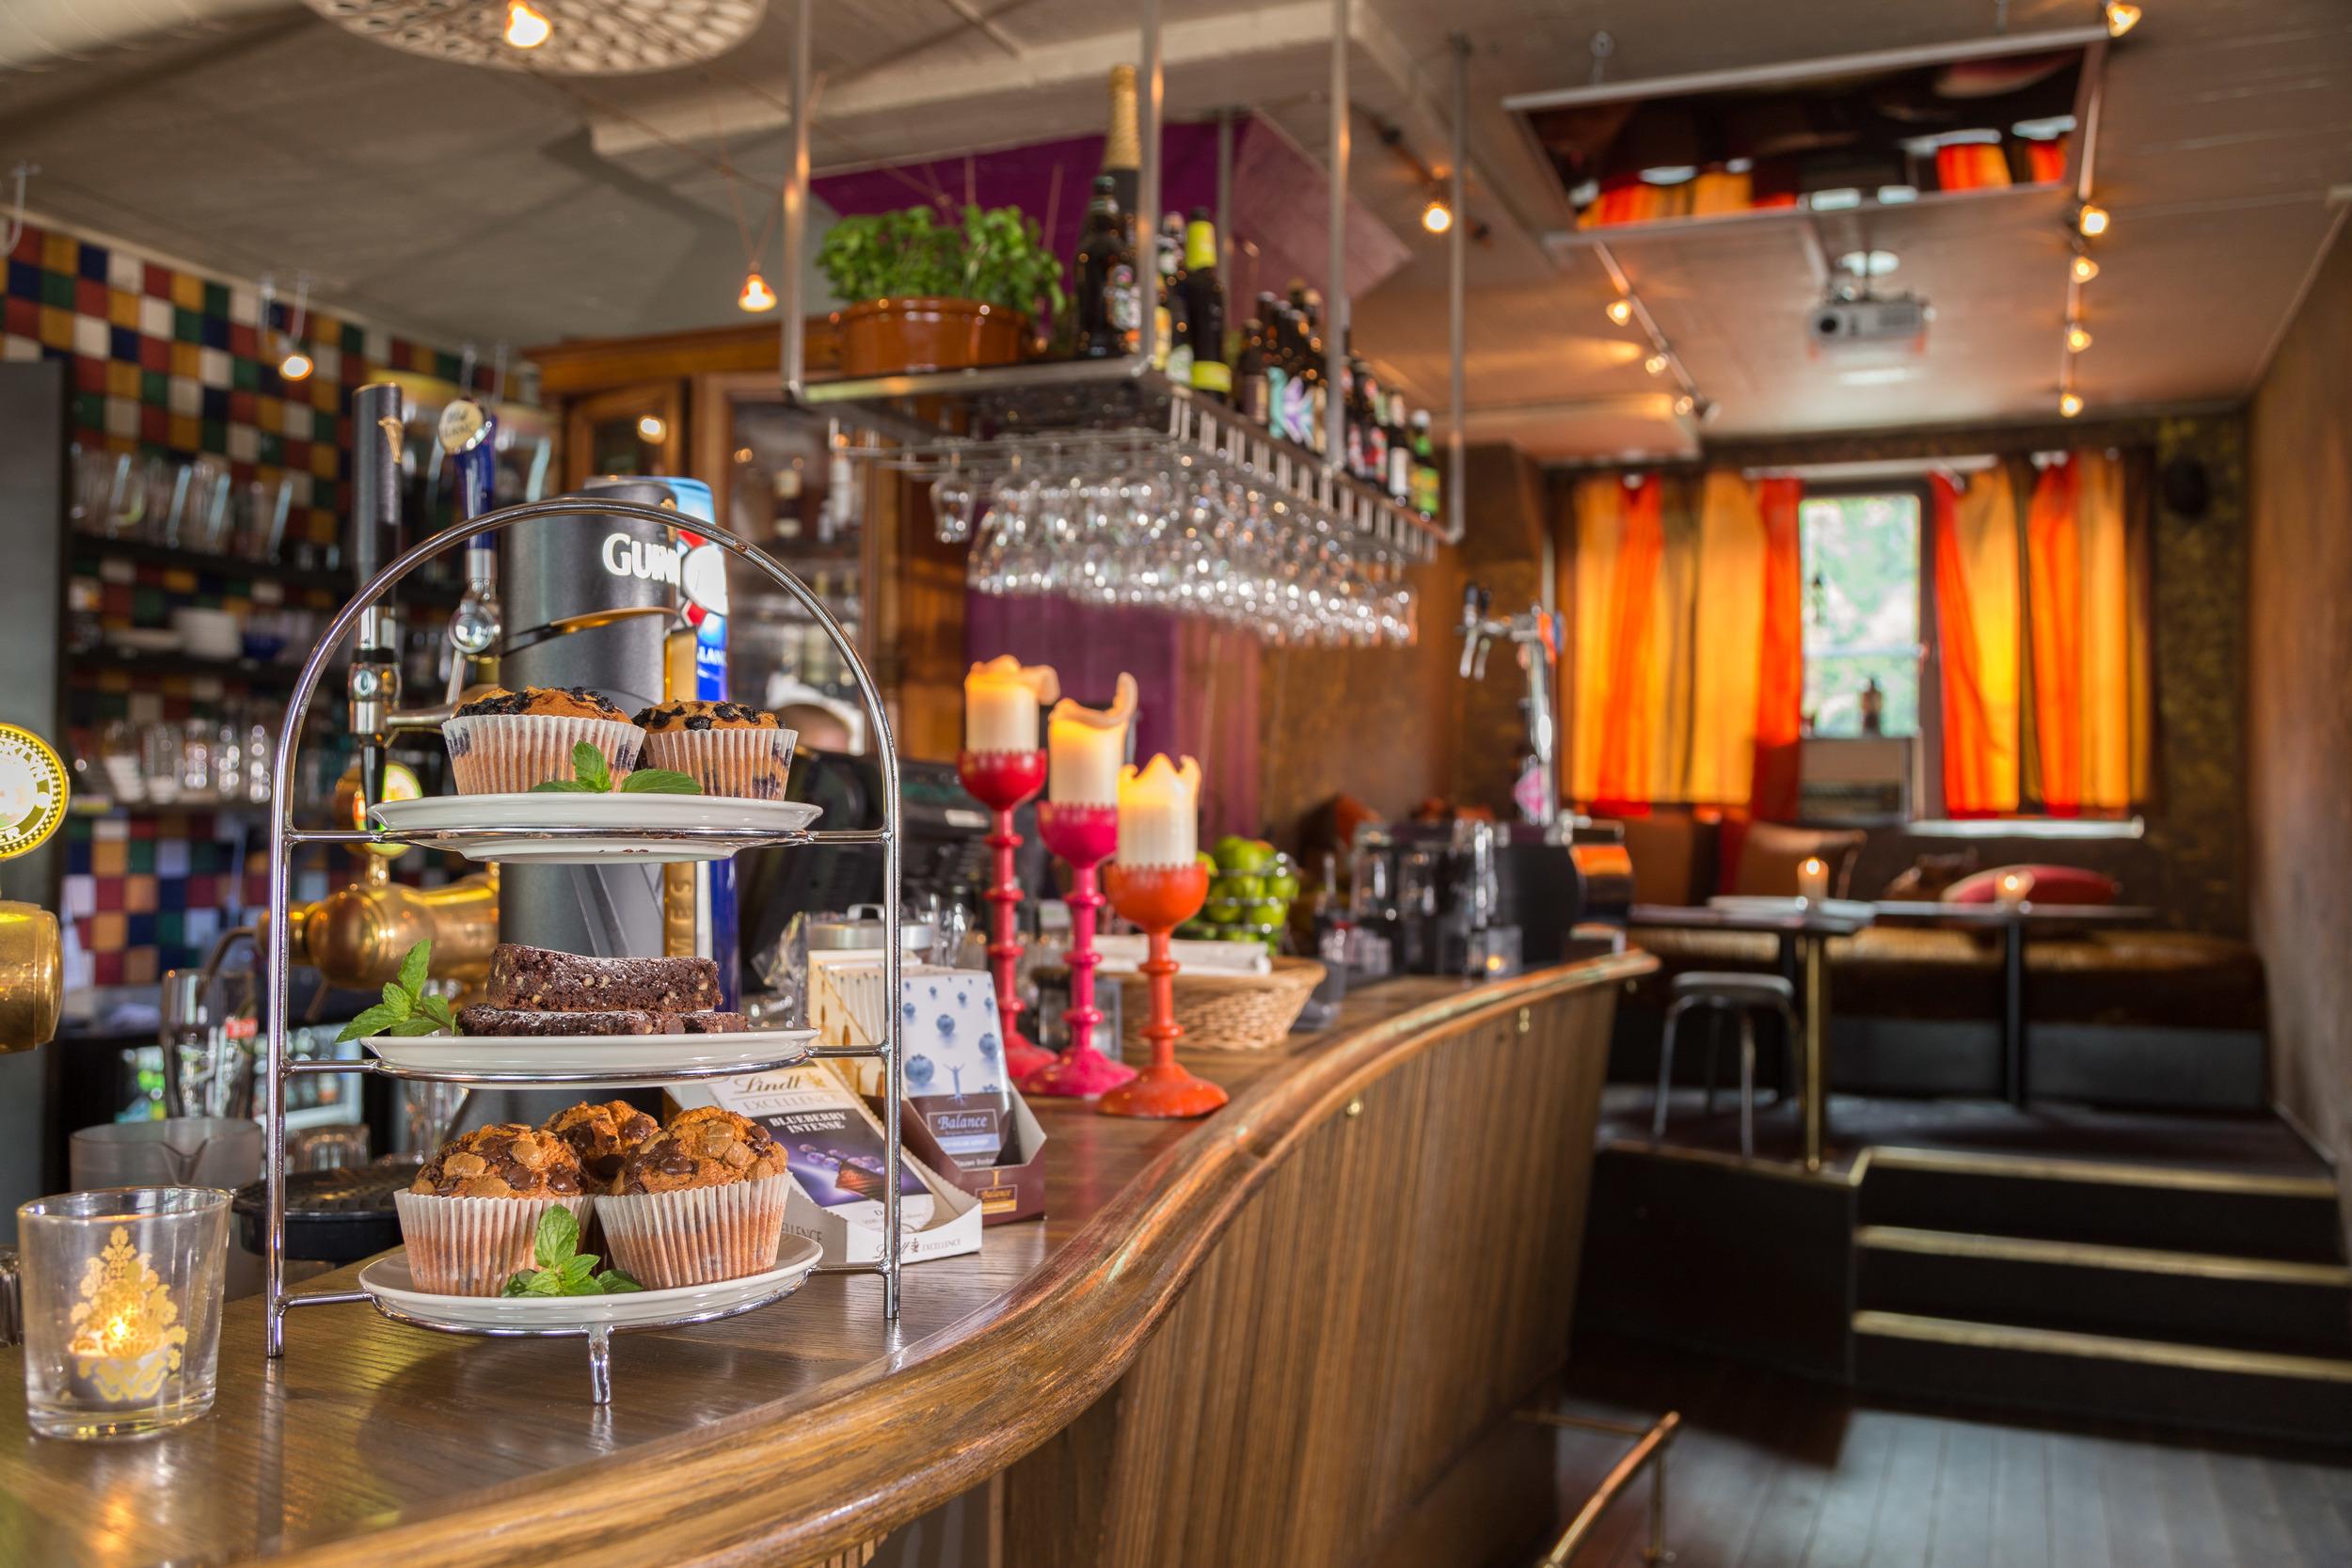 Cafe-bare-blåbær-bær-og-bar-trondheim-norge-47.jpg